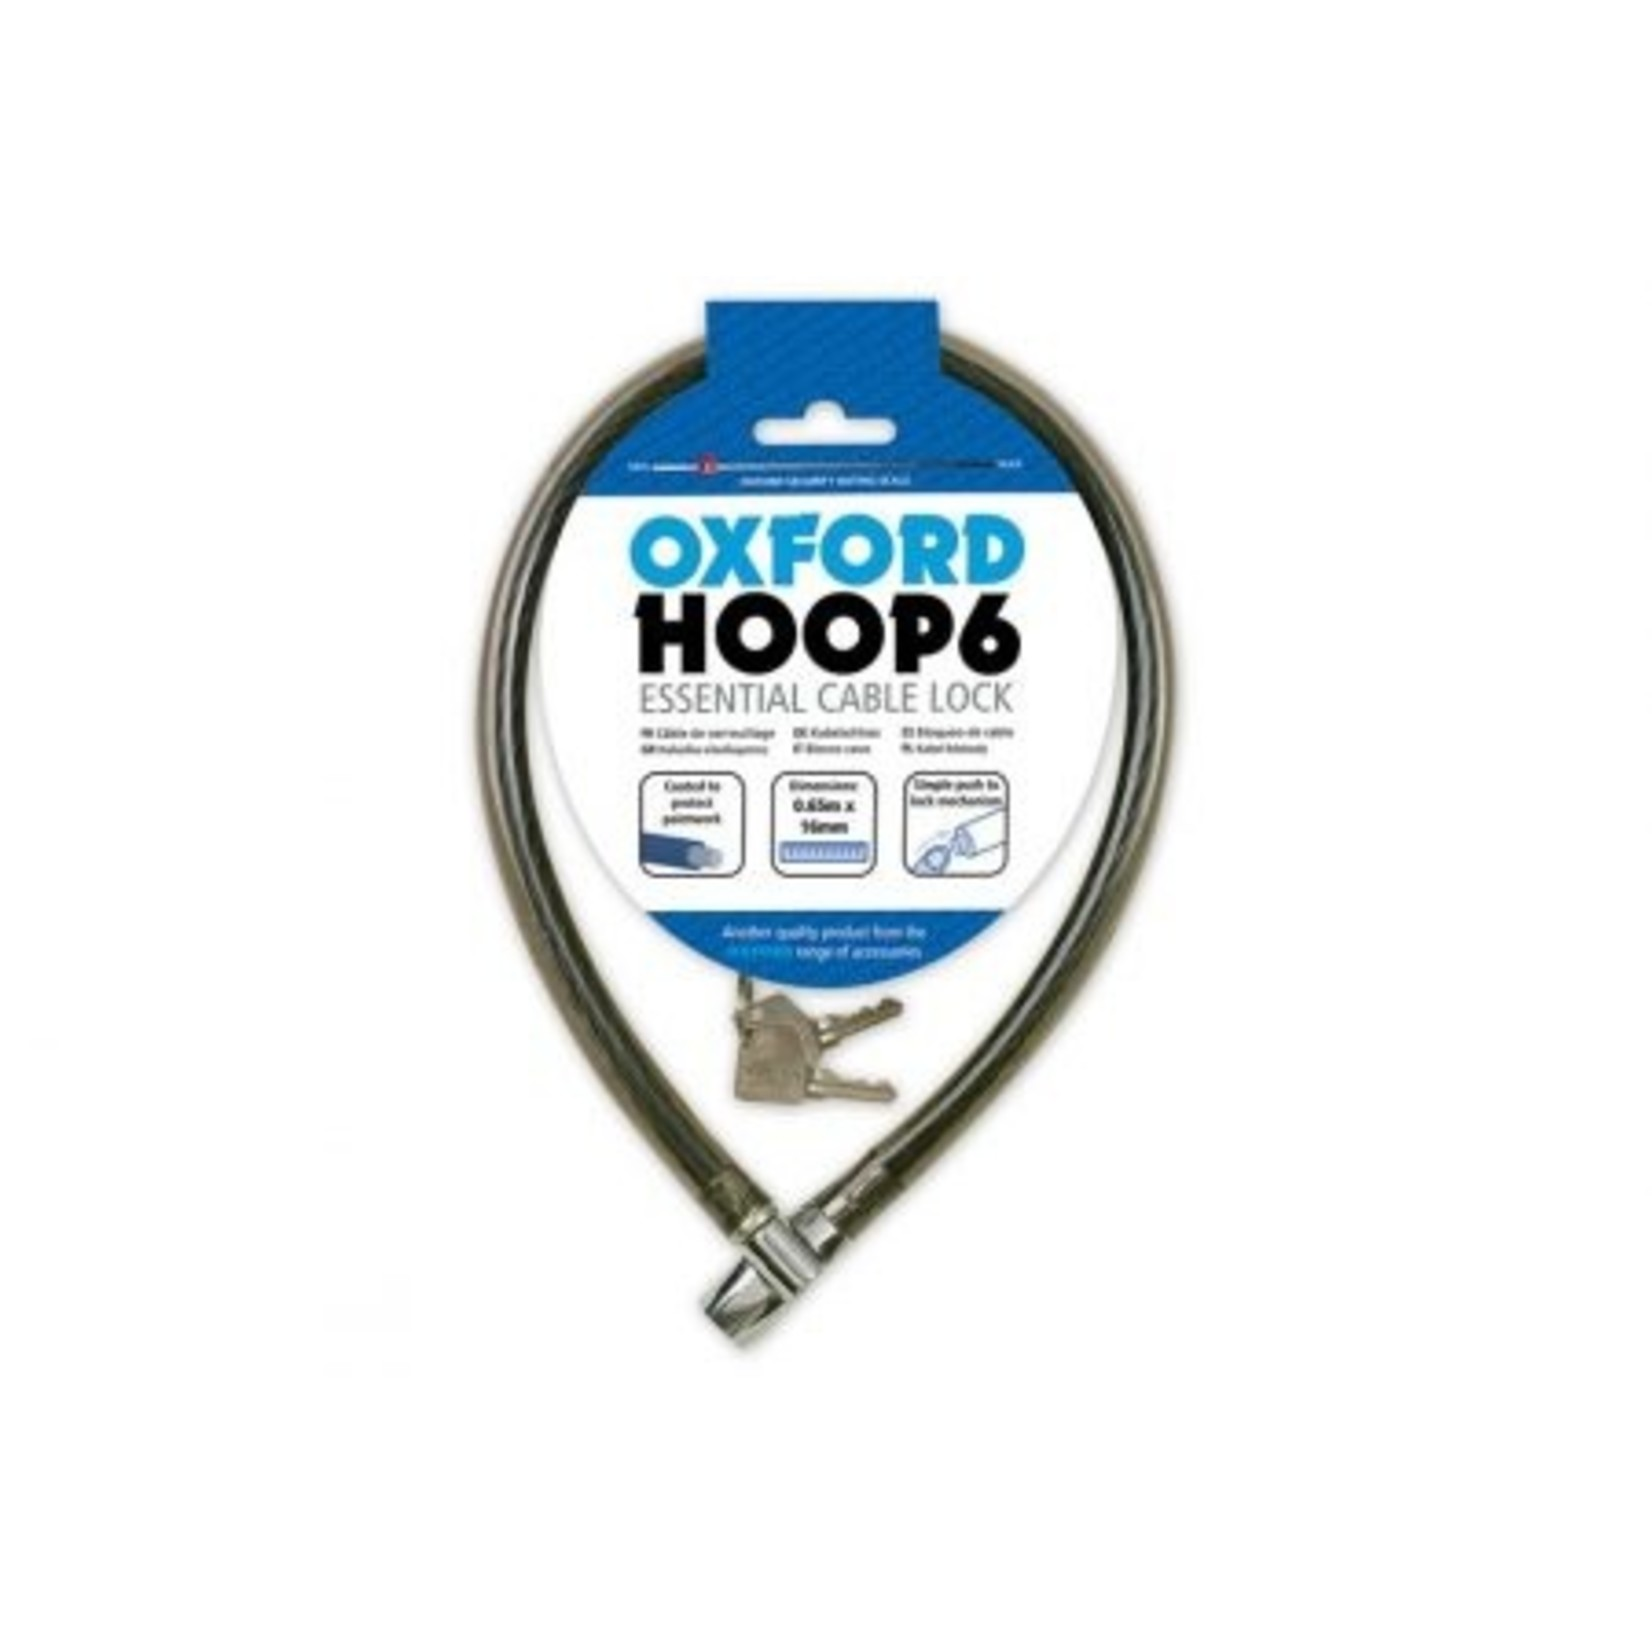 Oxford LK228 HOOP 10 Cable Lock - Smoke, 10mm x 650mm